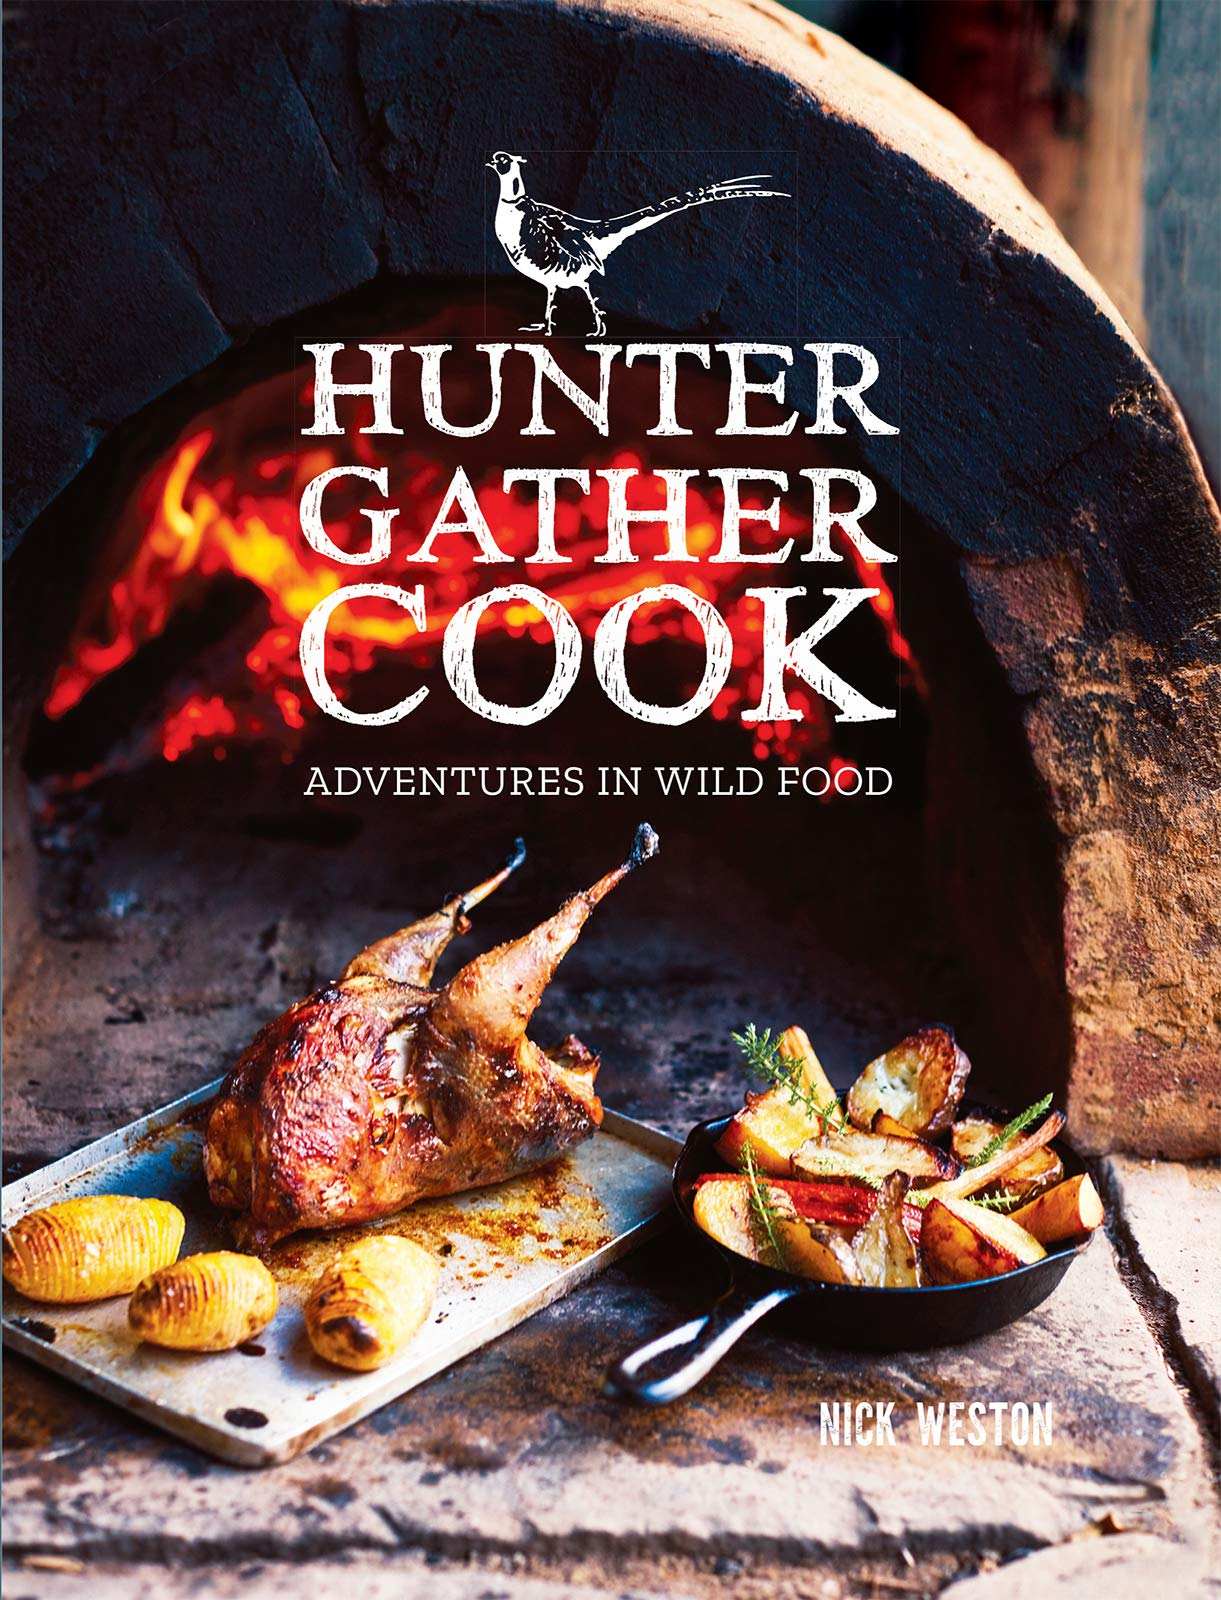 Hunter Gather Cook Adventures In Wild Food Amazon Co Uk Nick Weston 9781784944179 Books